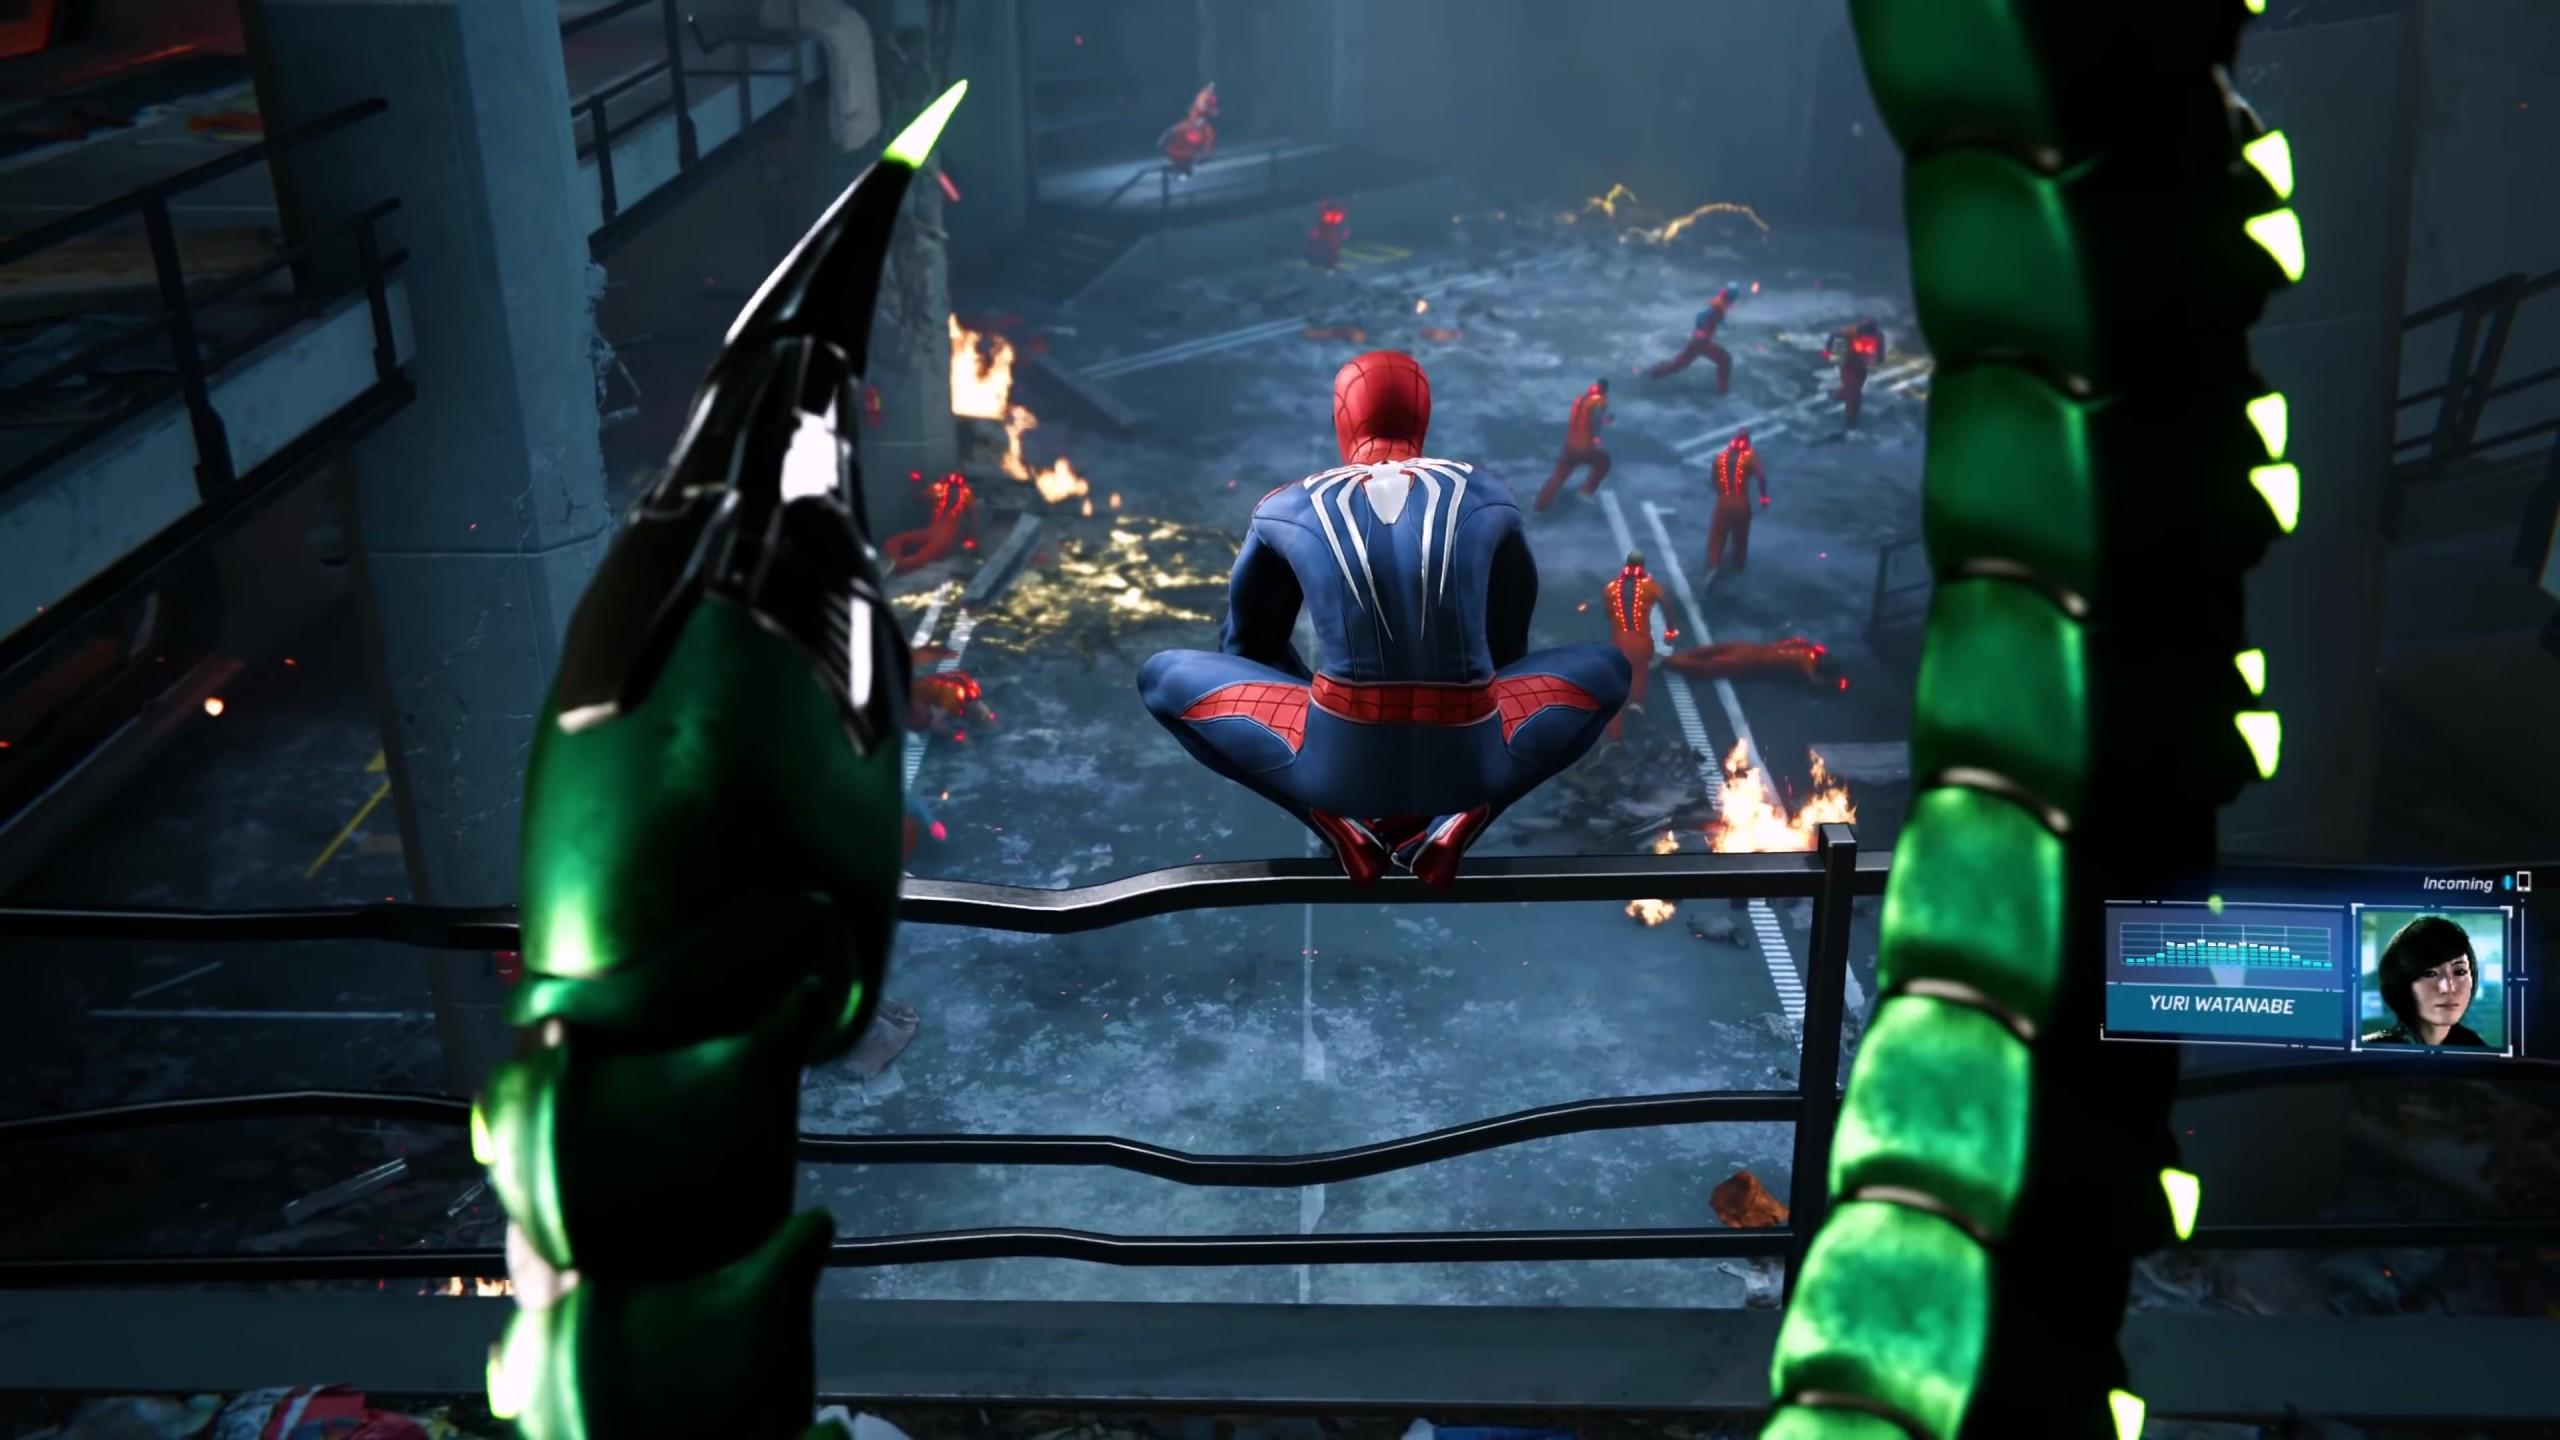 wallpaper marvel's spider-man, e3 2018, screenshot, 4k, games #19182